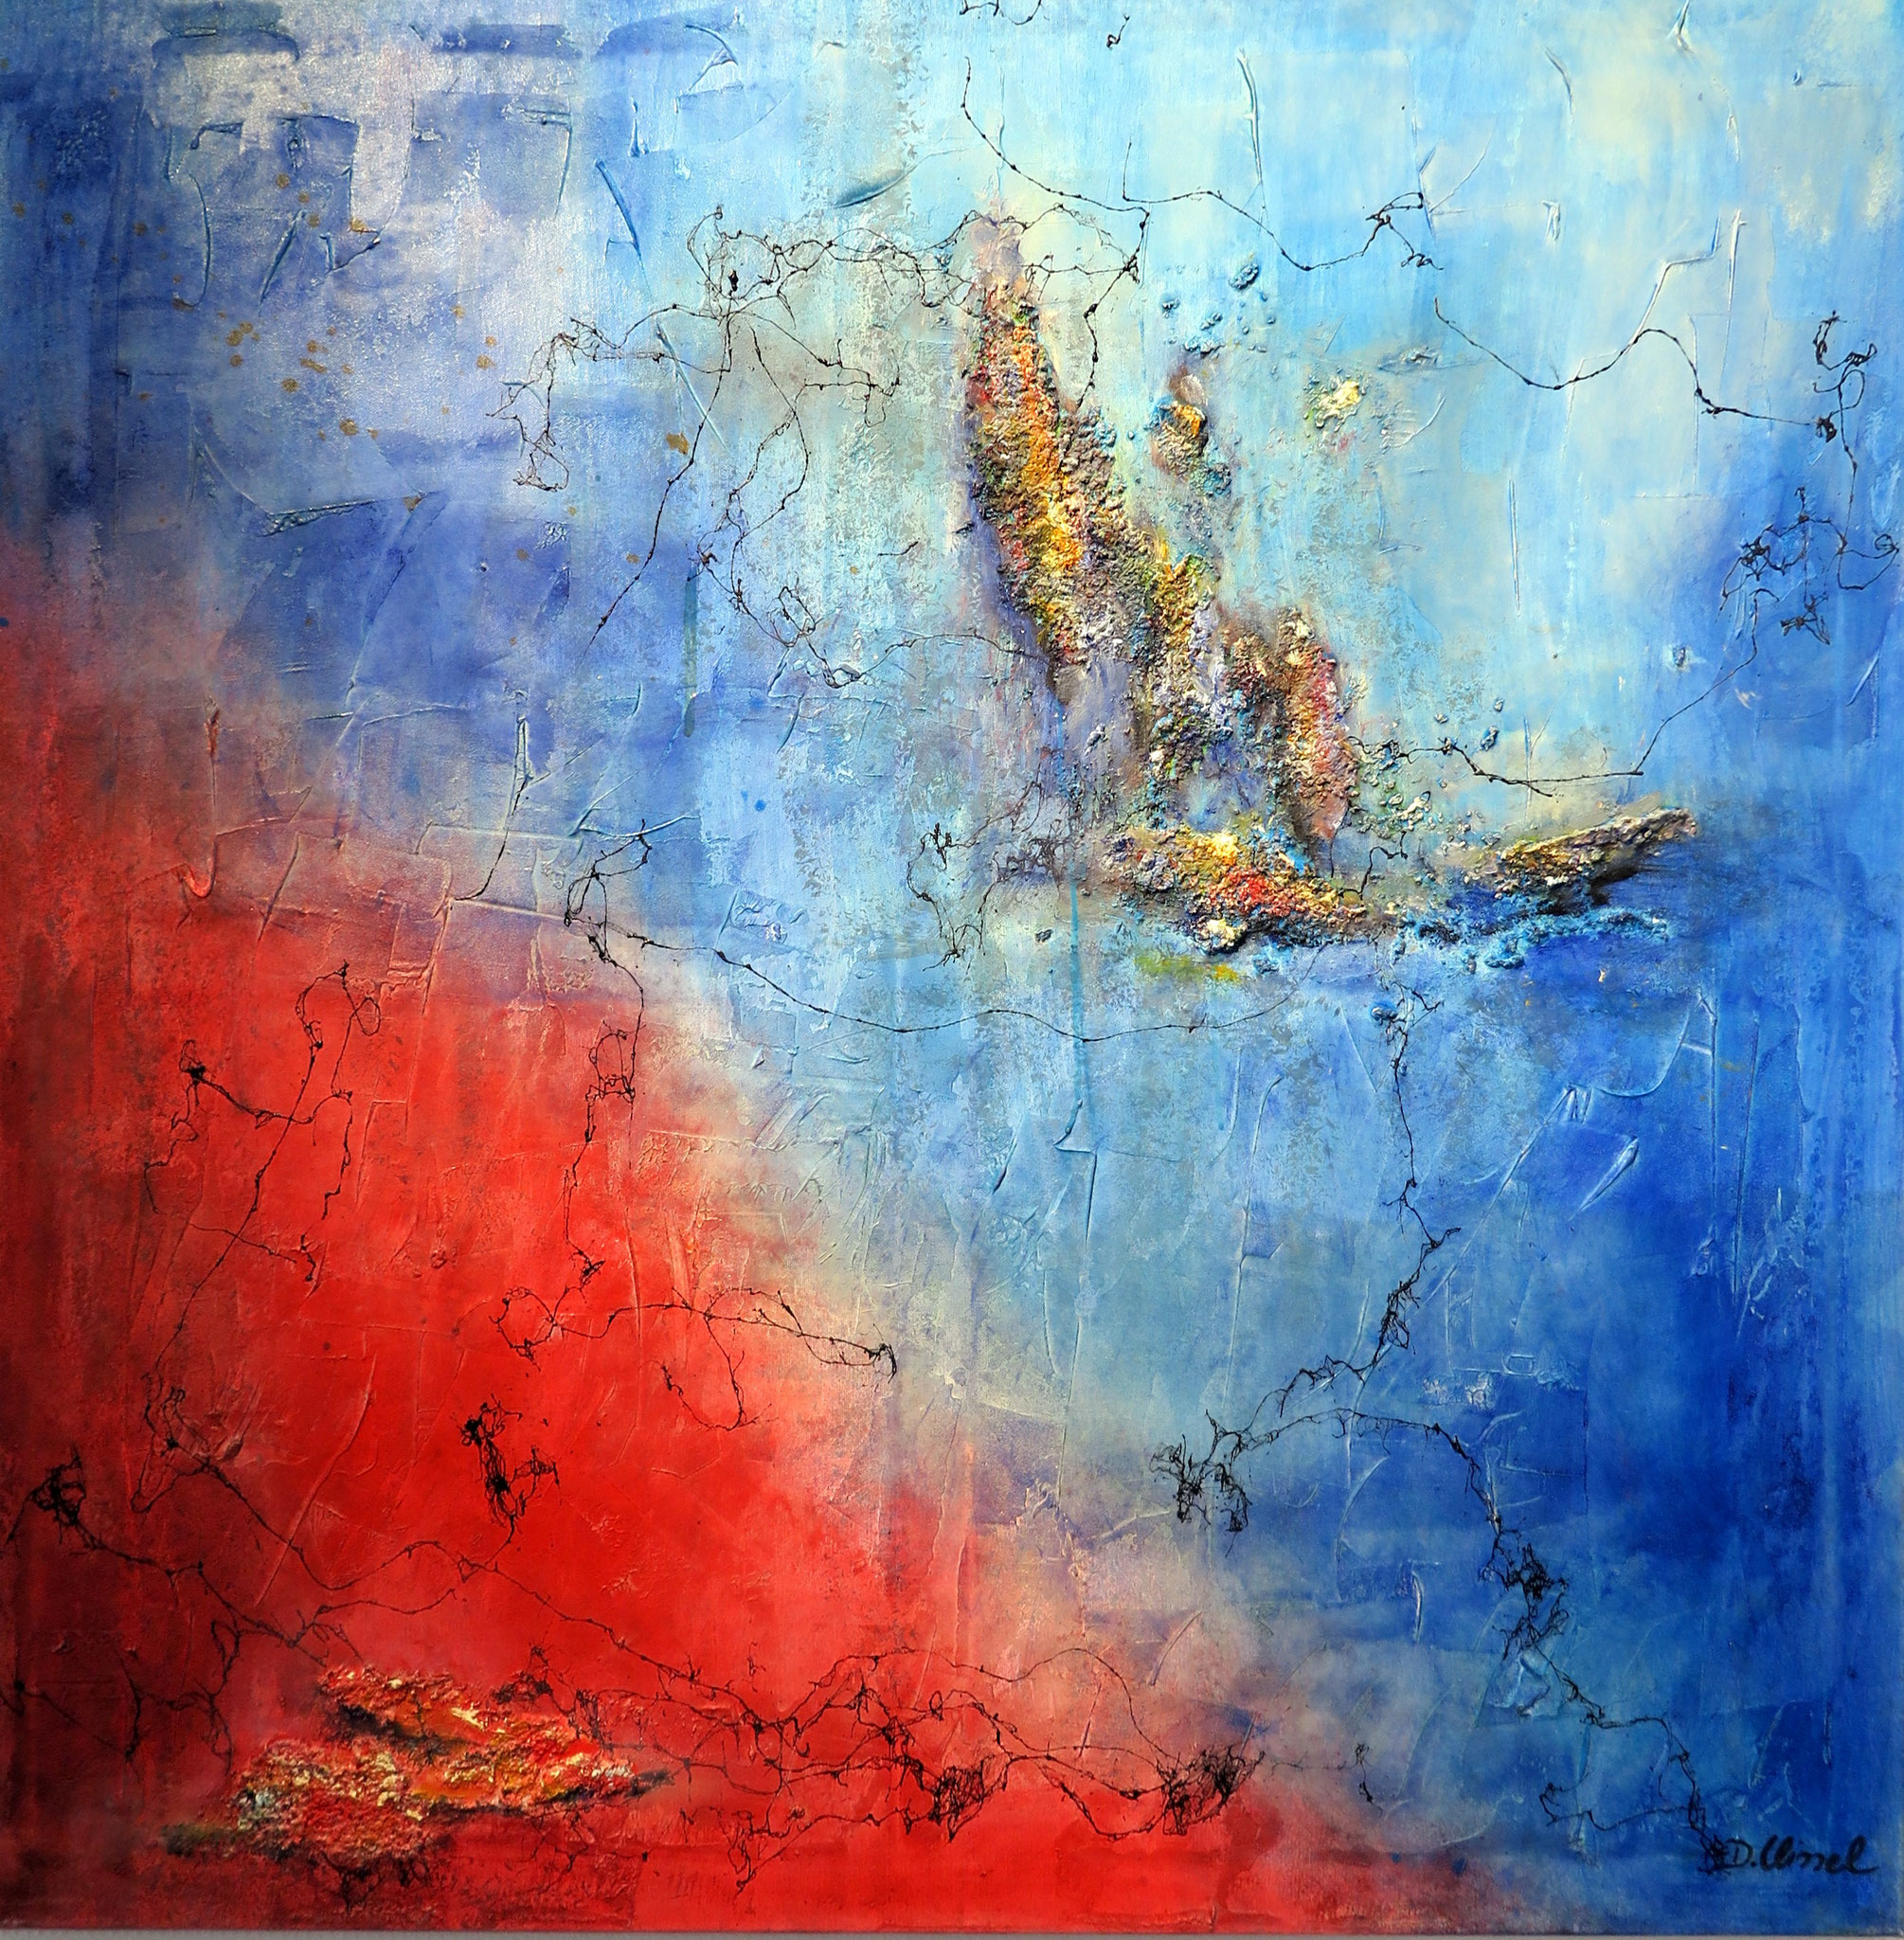 Rot-Blau 1 100 x 100 cm